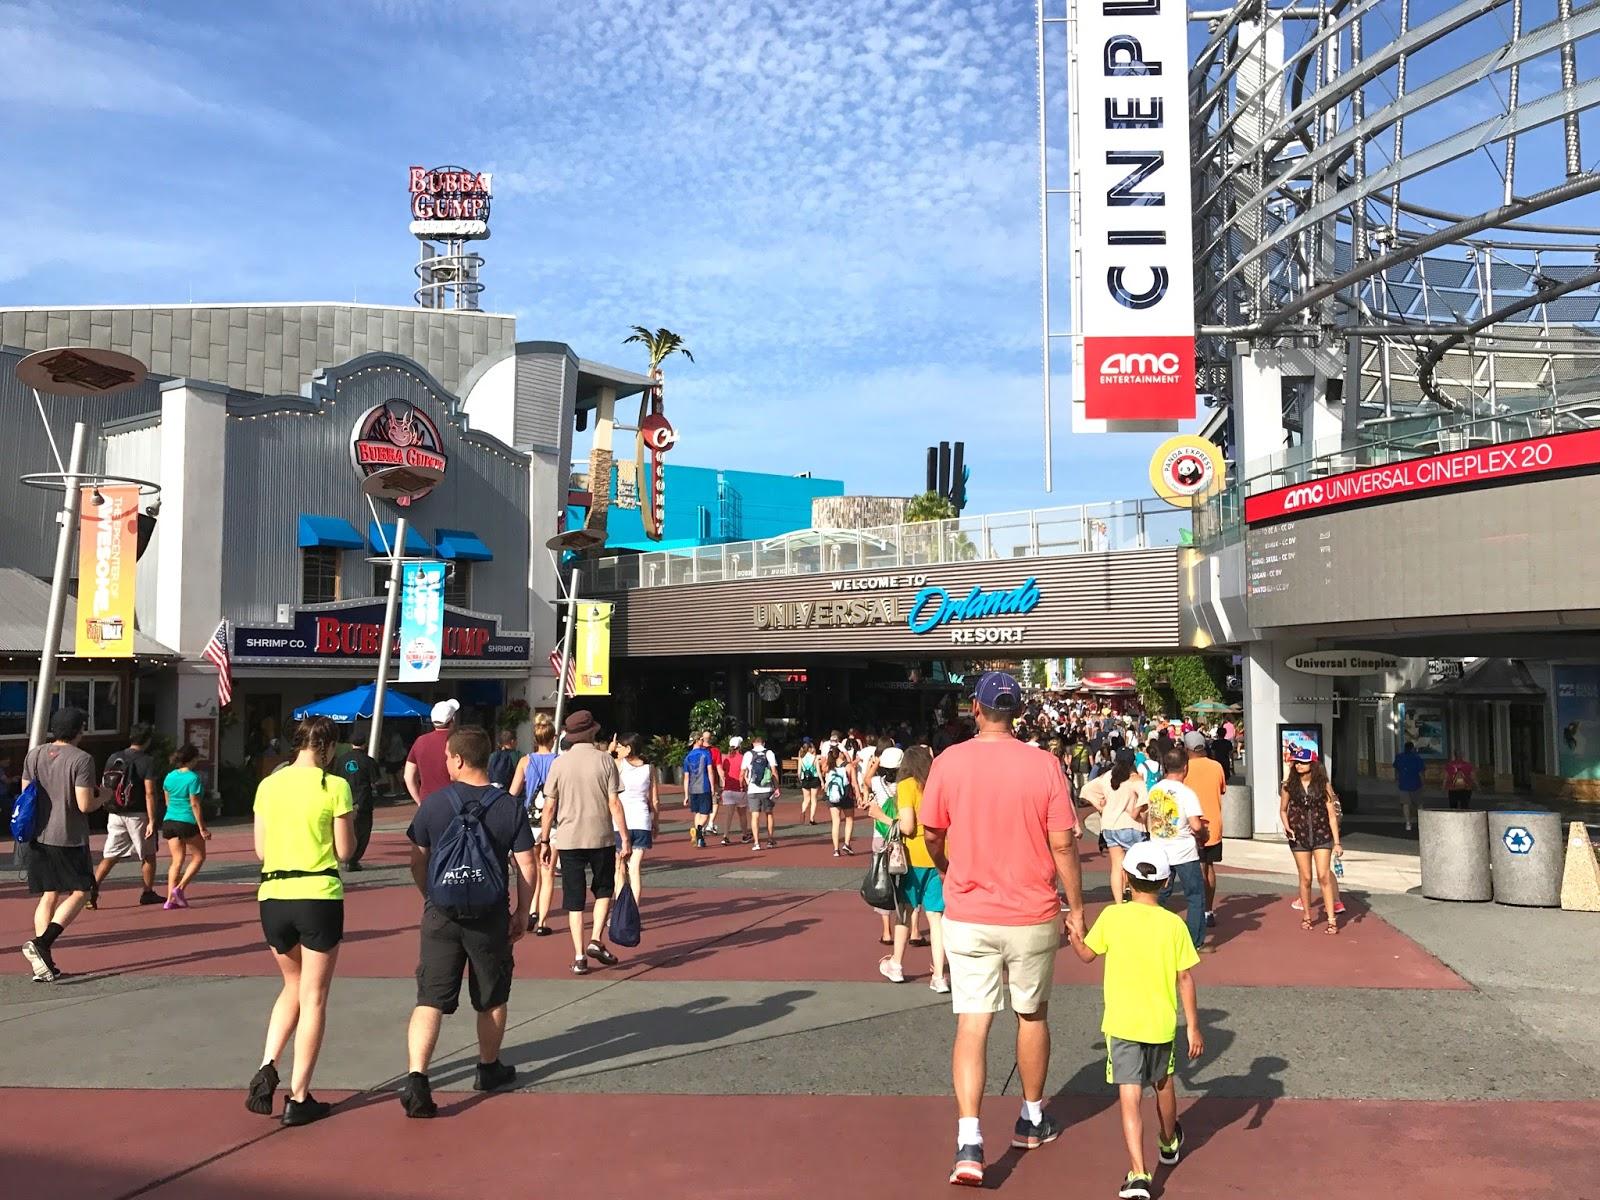 Universal Orlando | Univeral CityWalk